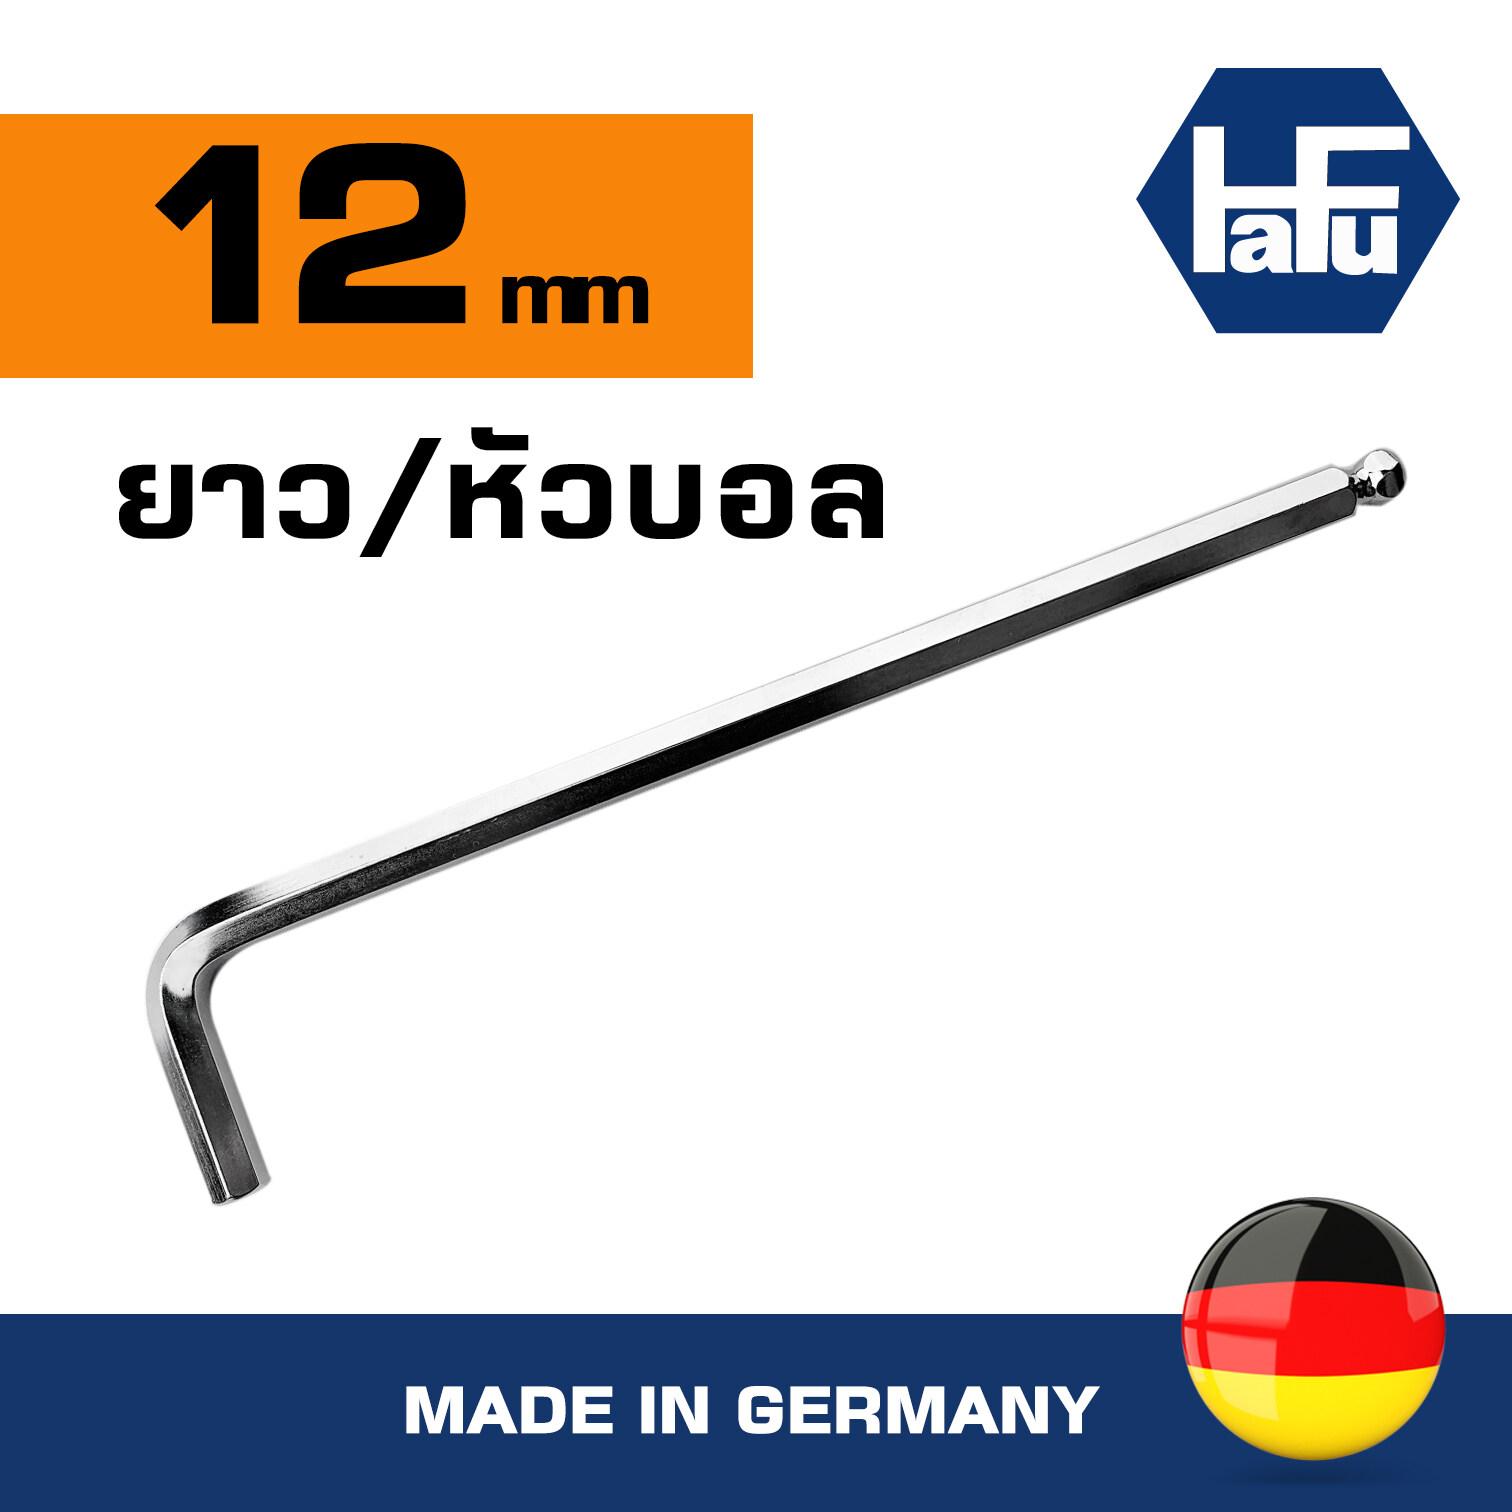 Hafu หกเหลี่ยม ยาว หัวบอล เหล็กCR-MO+V เอียงได้ 30 องศา Made in Germany (ขนาดเลือกได้ตอนสั่งซื้อ)